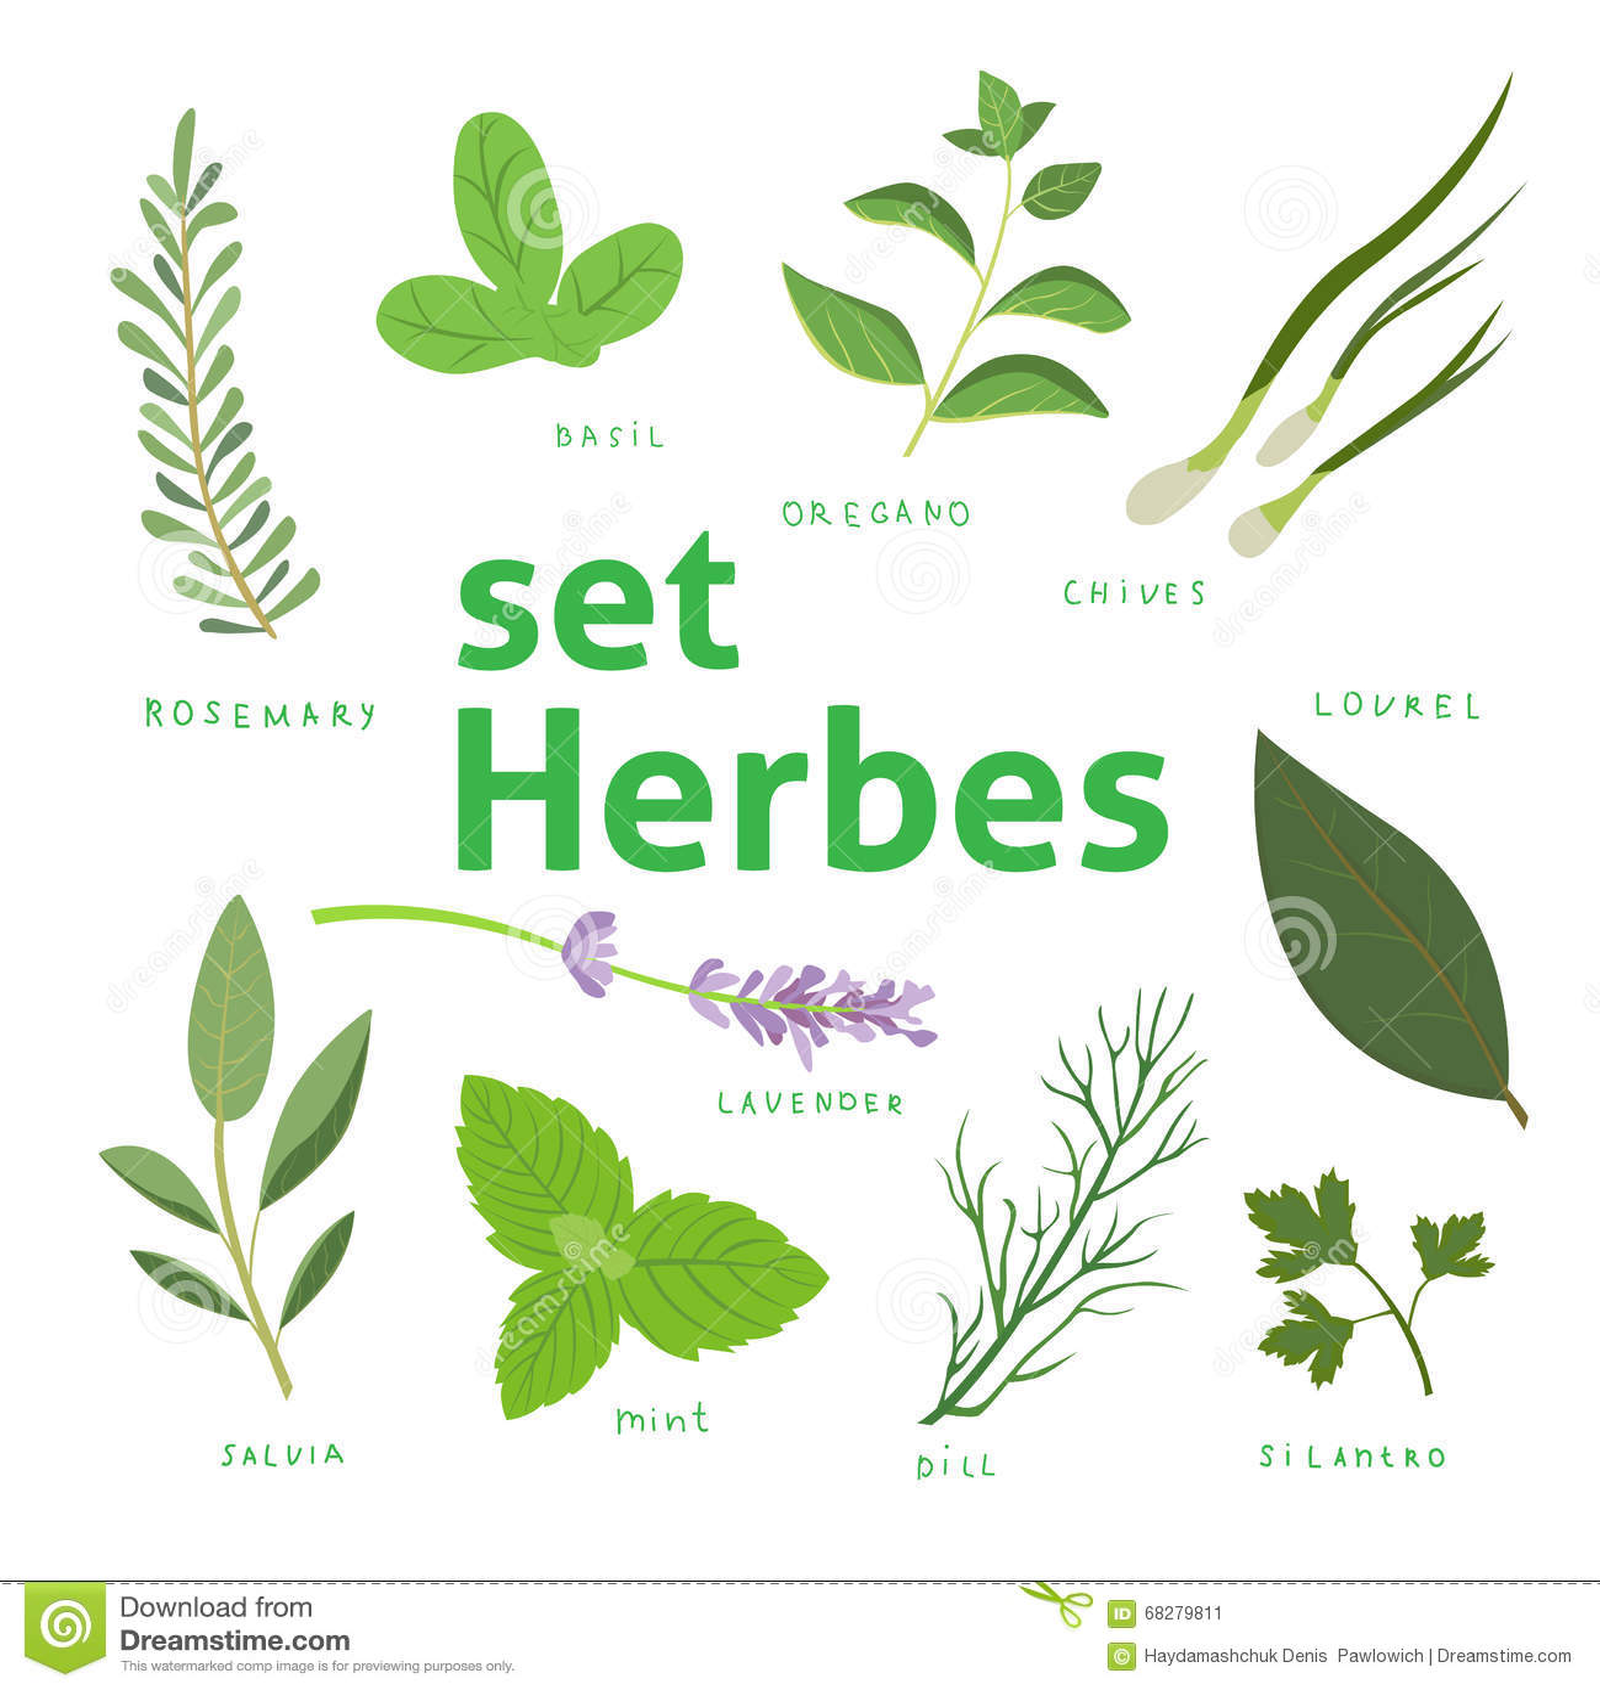 herbes aromatiques r gl es herbes fra ches et pices r gl es illustration de vecteur env 10. Black Bedroom Furniture Sets. Home Design Ideas